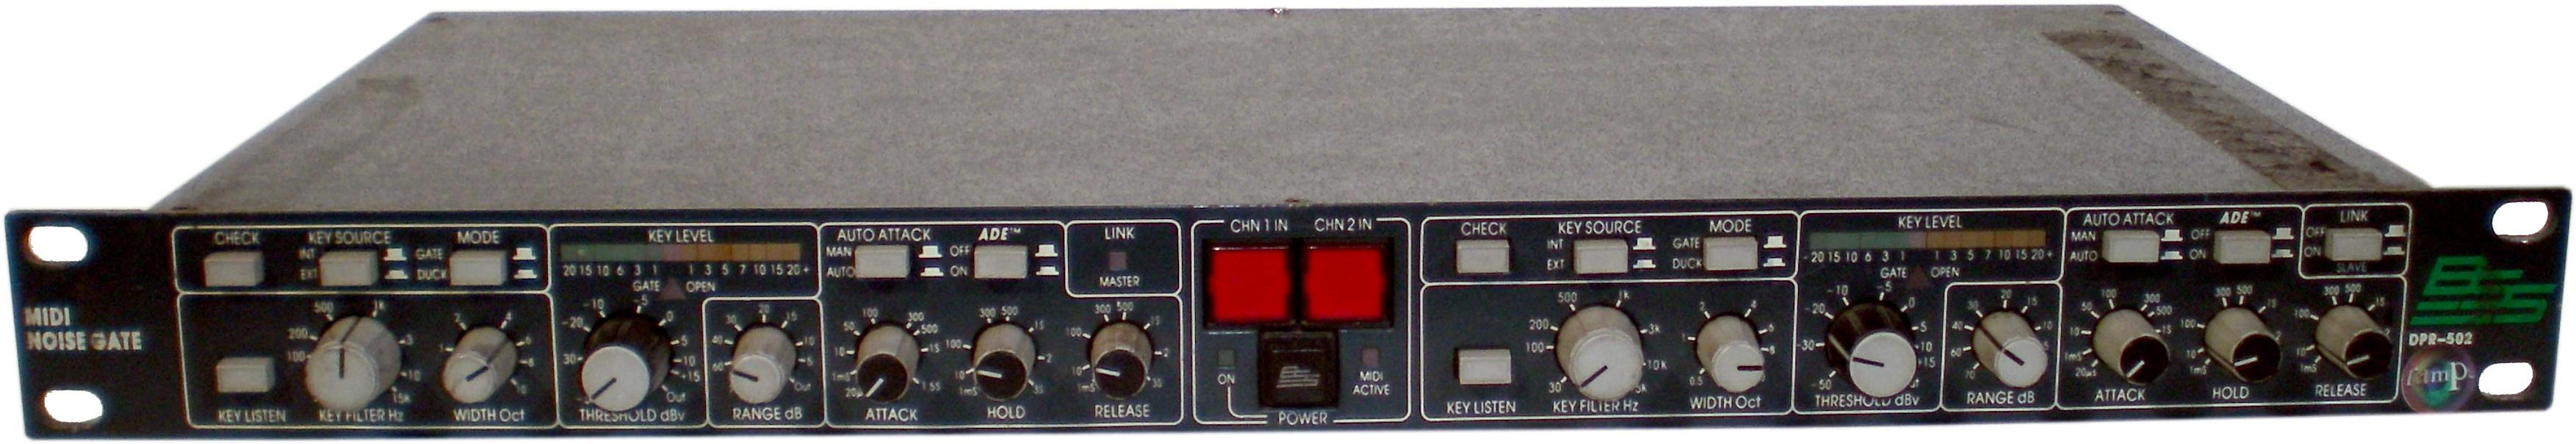 BSS - DPR-502 - Dual midi noise gate (Used)